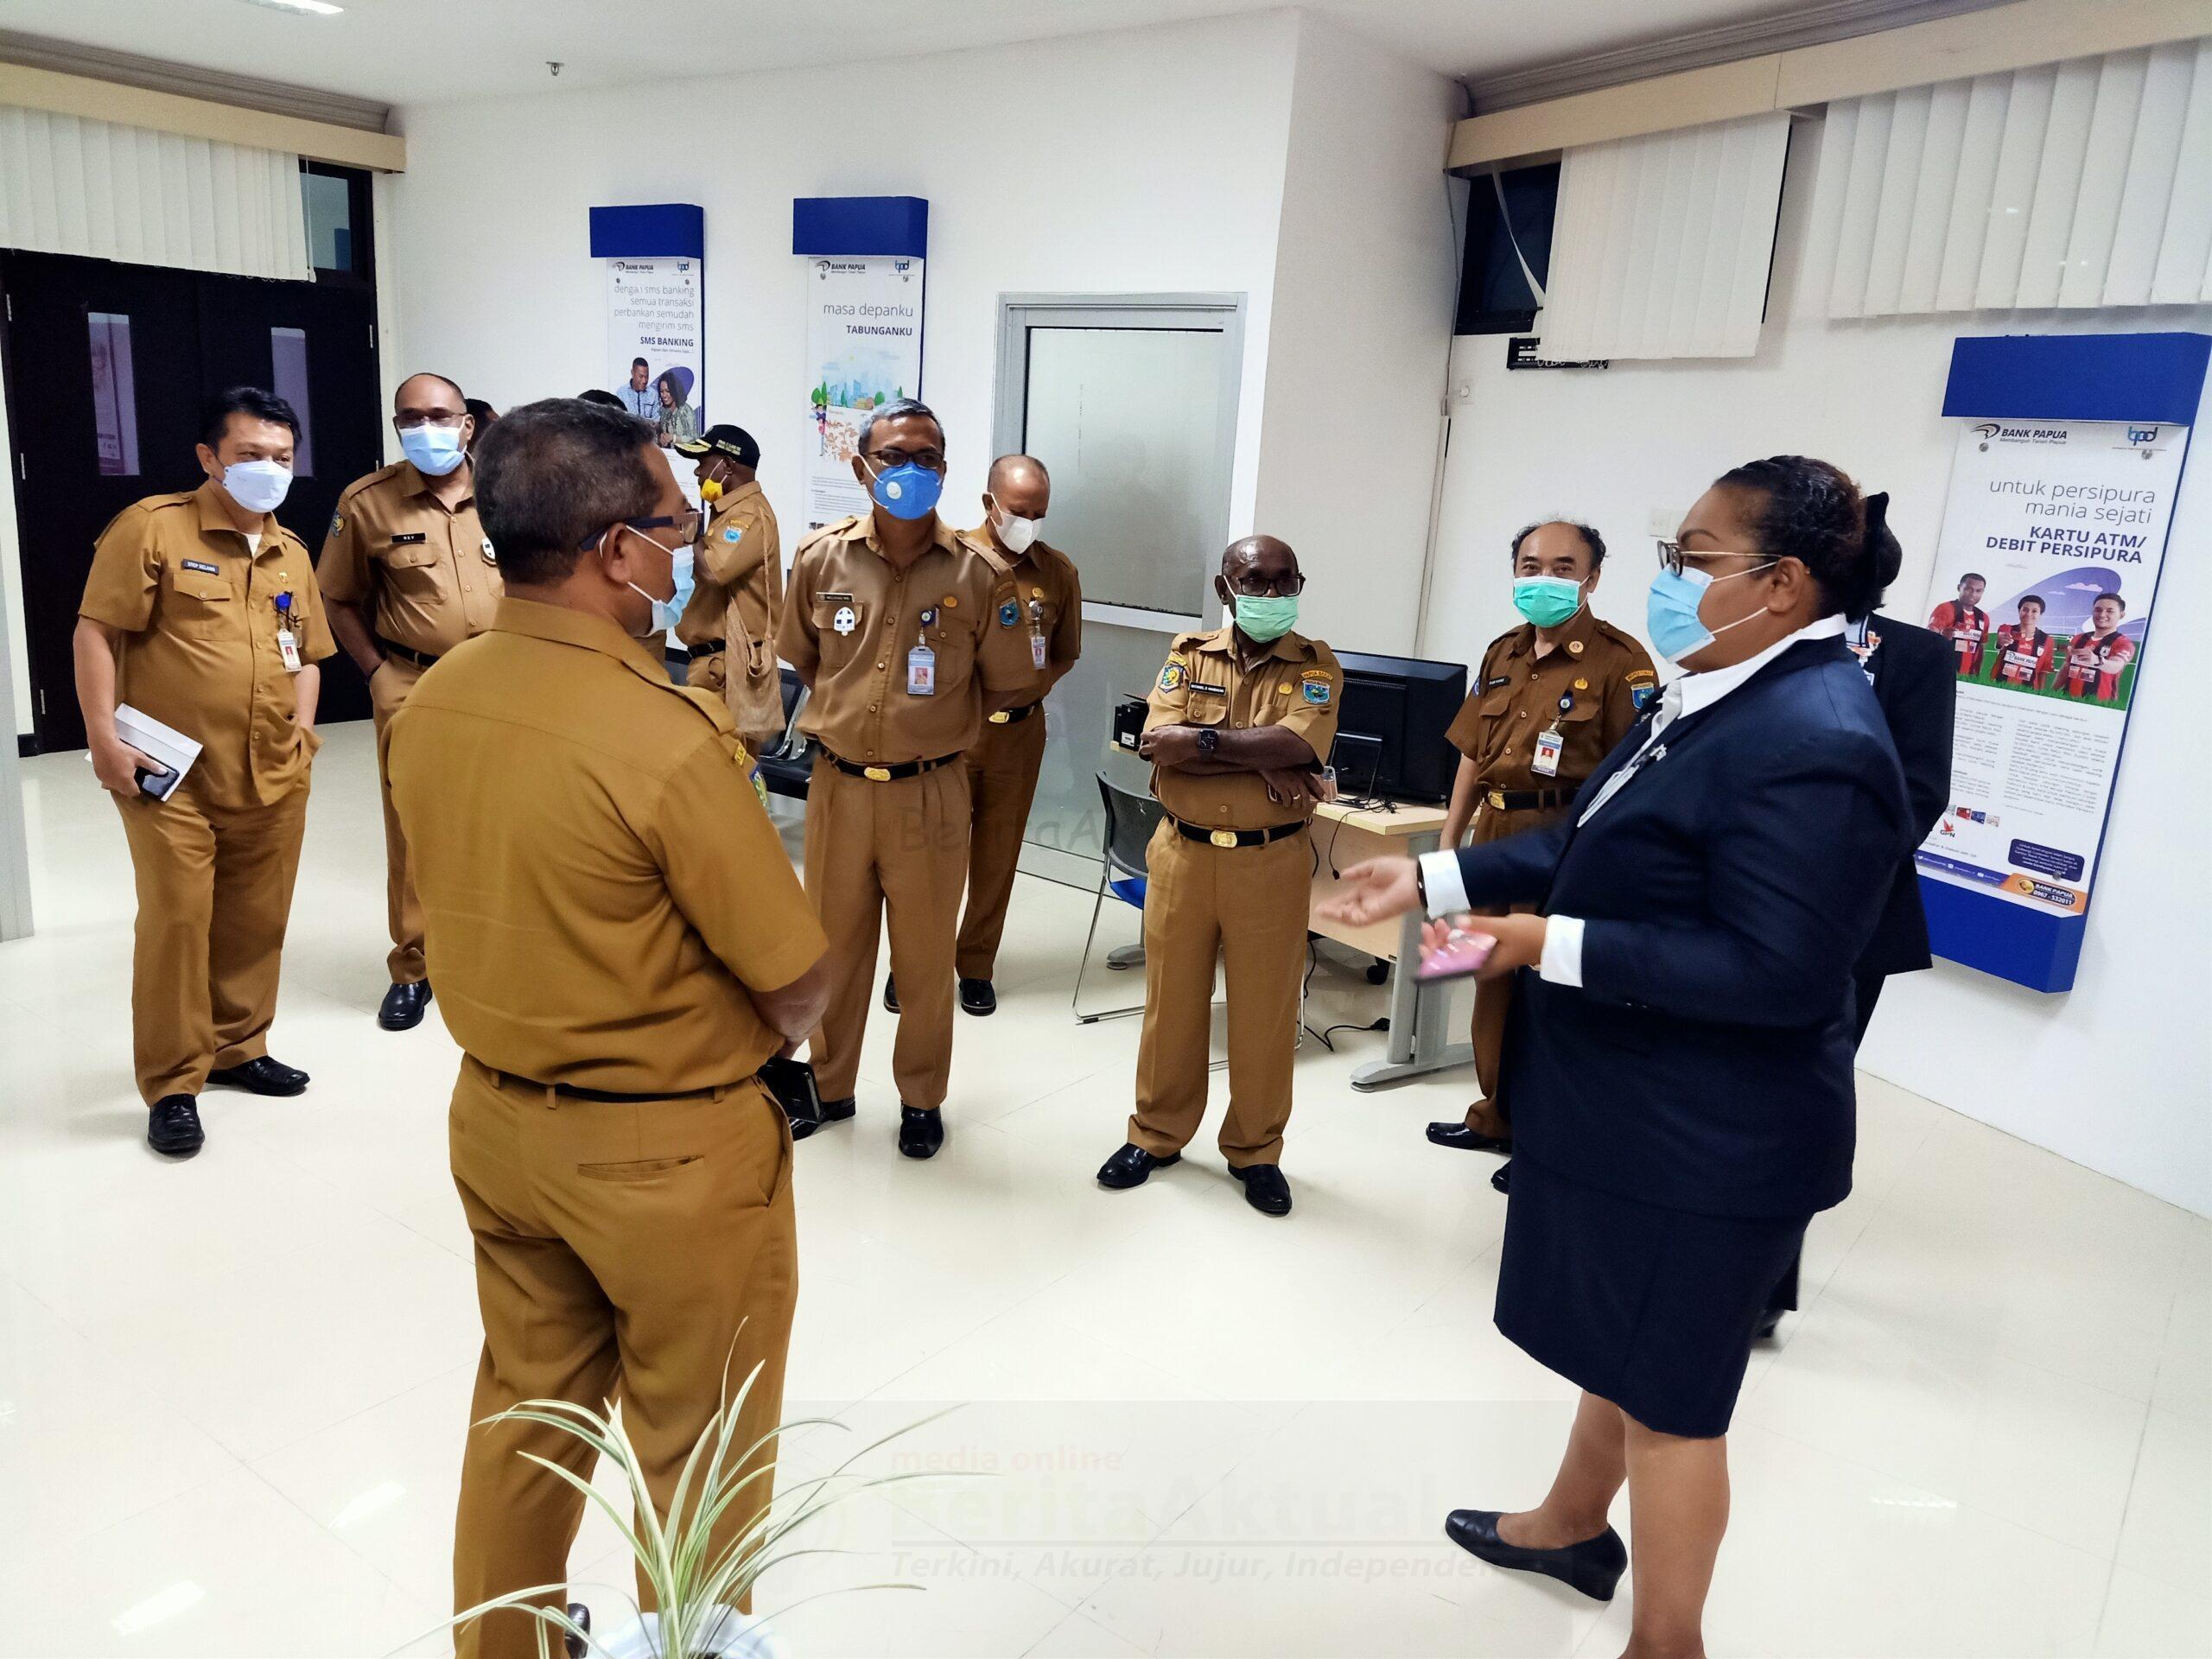 Kantor Cabang Pembantu Bank Papua Kini Resmi Beroperasi di Kantor Gubernur Arfai 2 IMG20210111112042 scaled